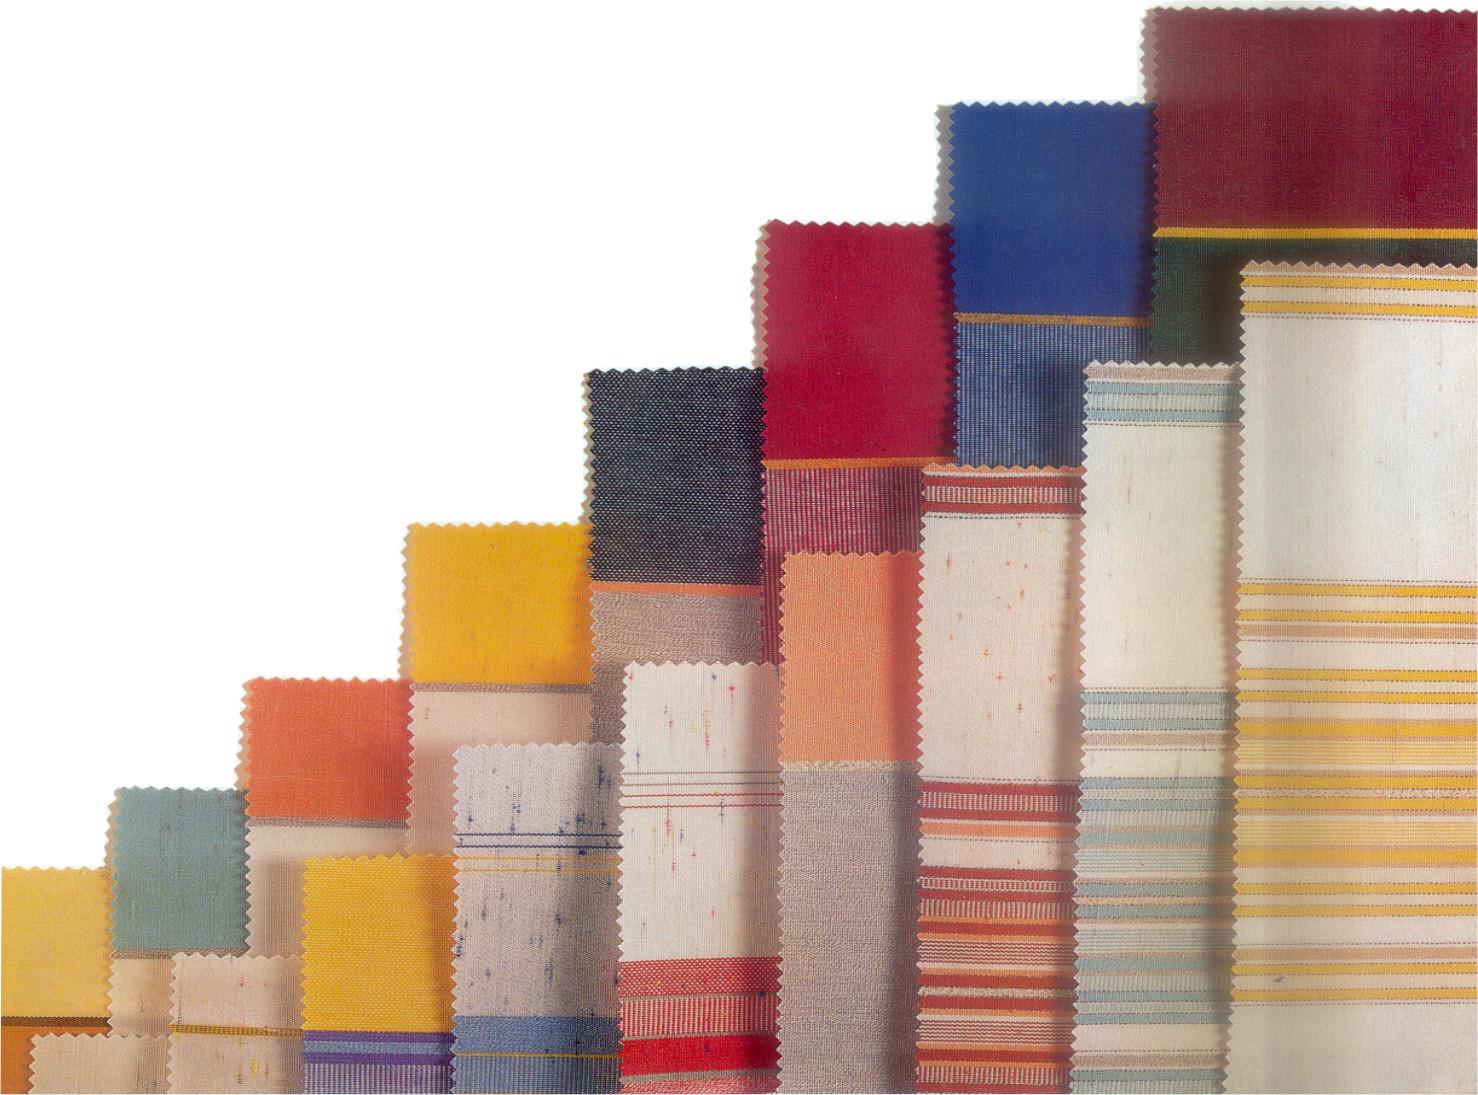 Telas para tapizar 1 parte decoraci n - Tipos de tela para tapizar ...